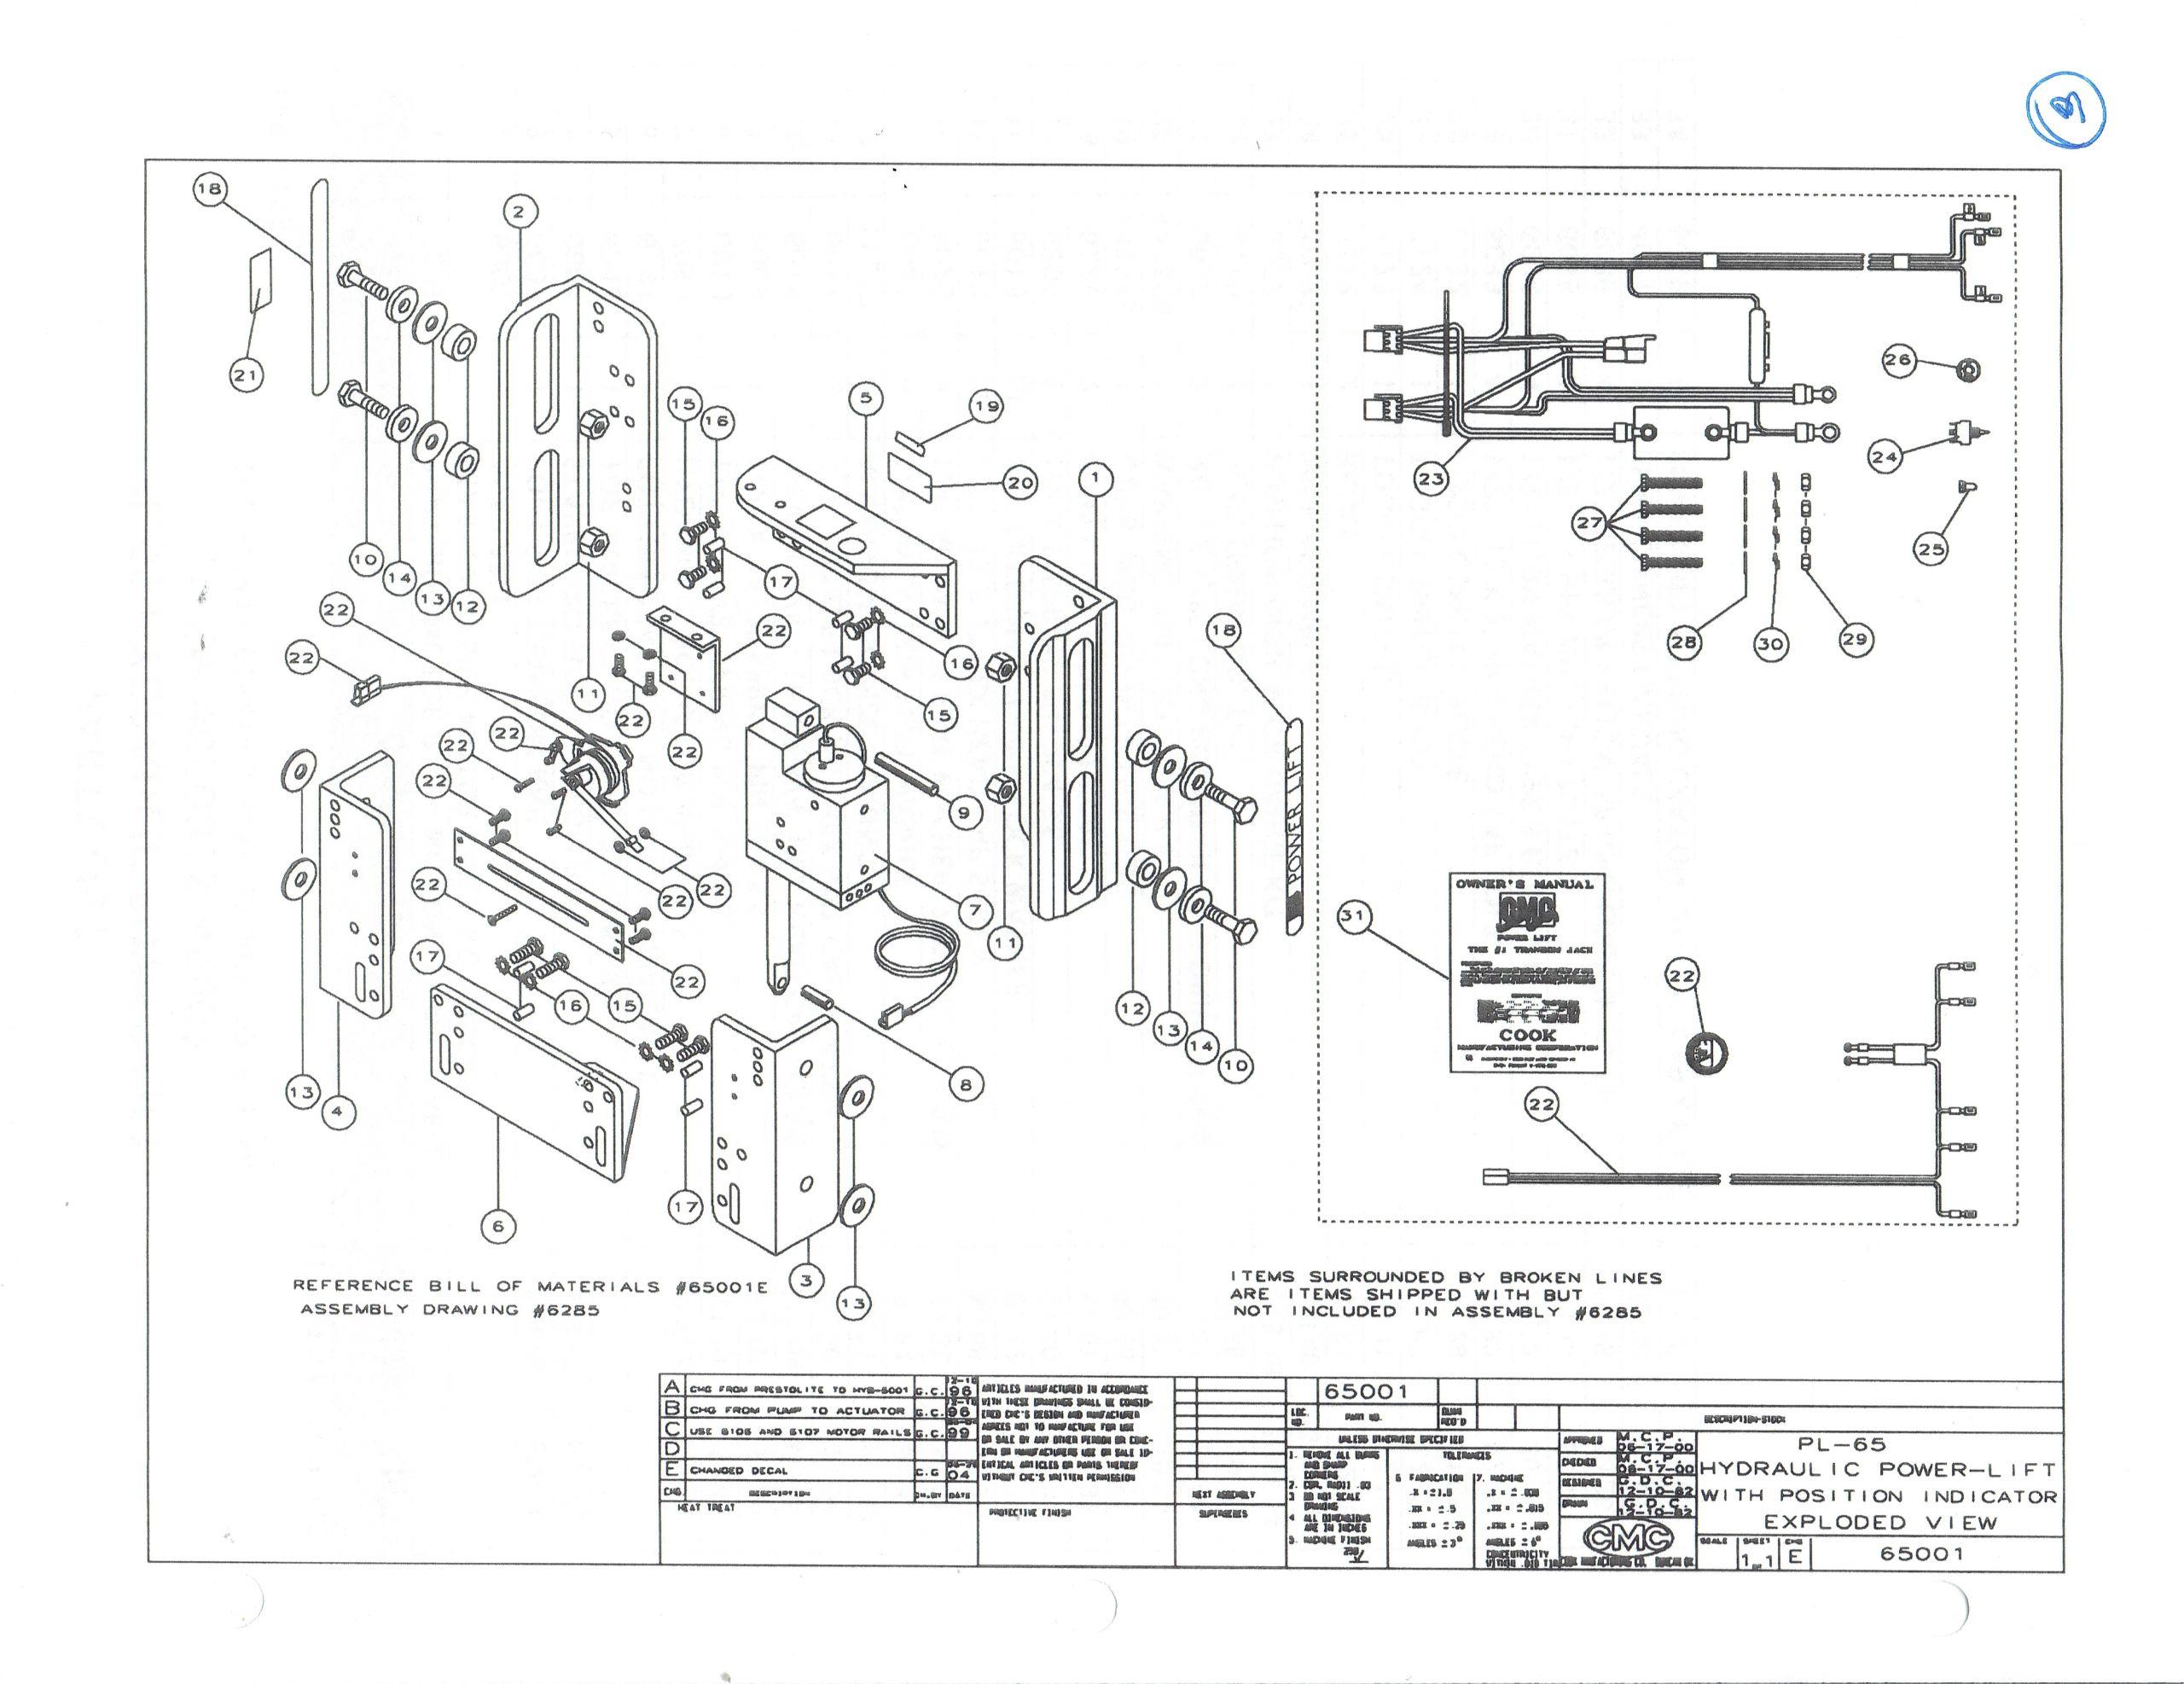 cmc jack plate wiring diagram 1 wiring diagram source jpg